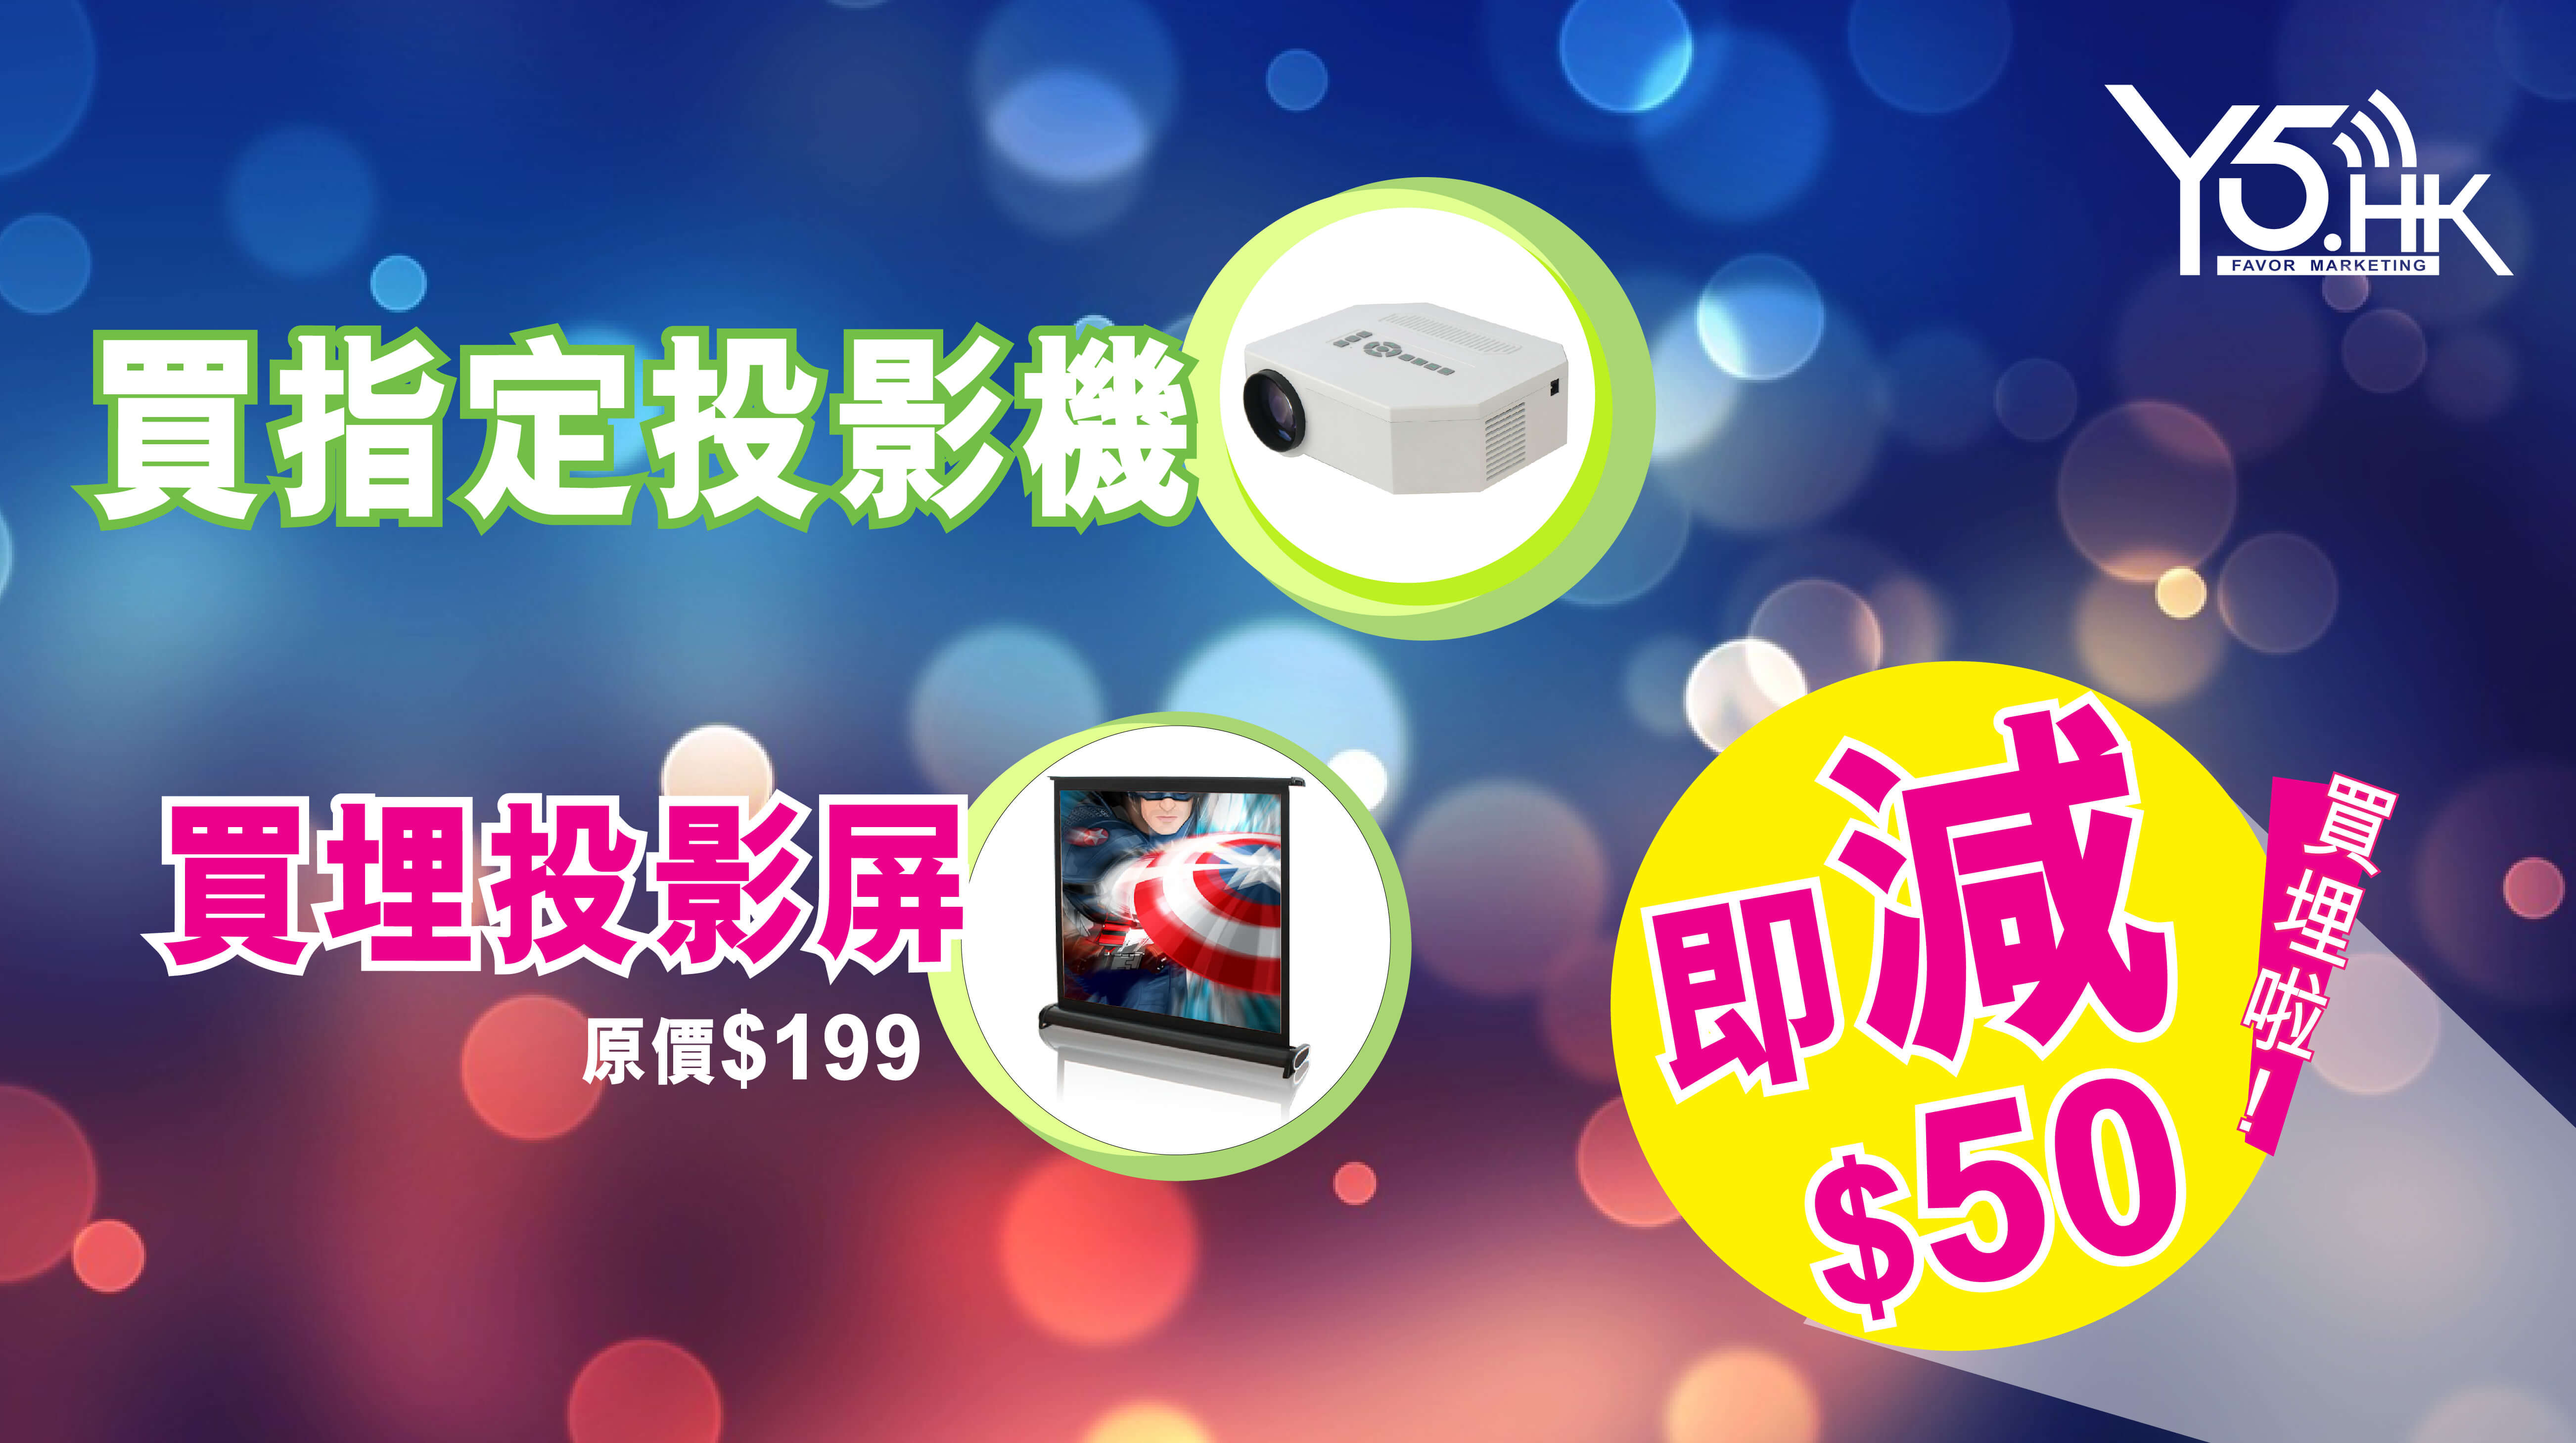 banner discount UC30-023